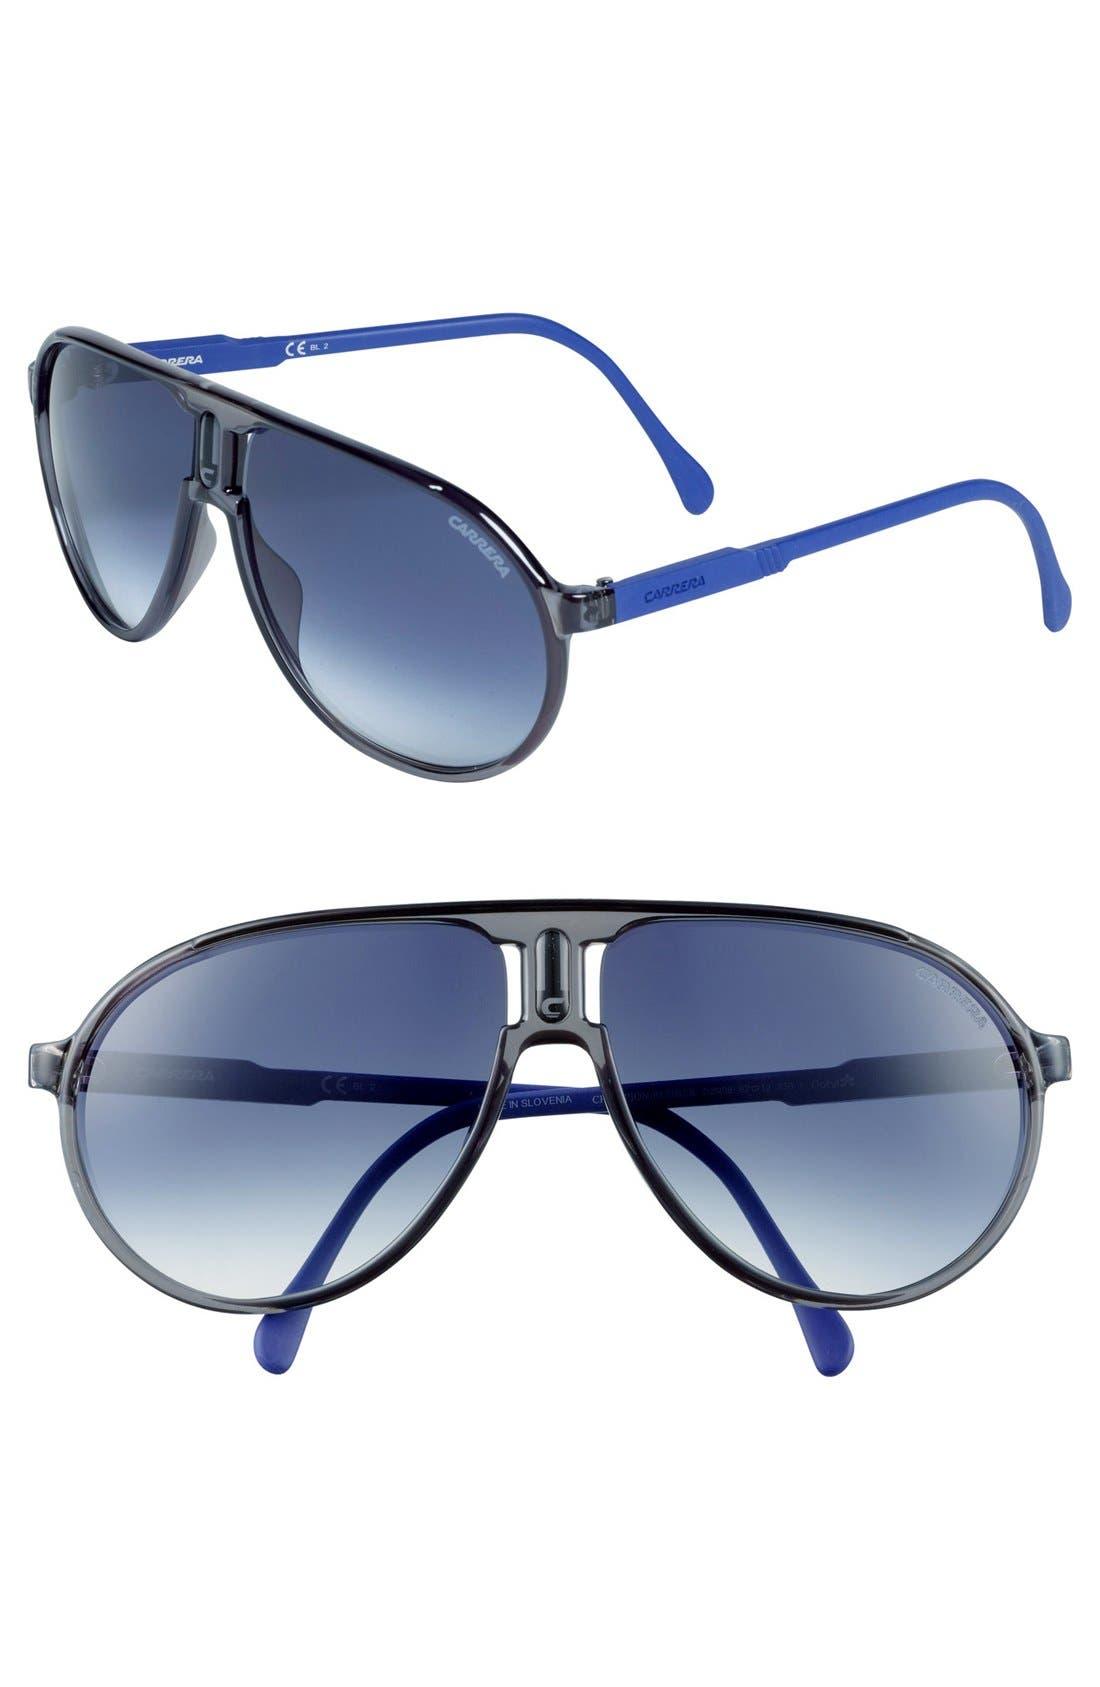 Alternate Image 1 Selected - Carrera Eyewear 62mm Aviator Sunglasses